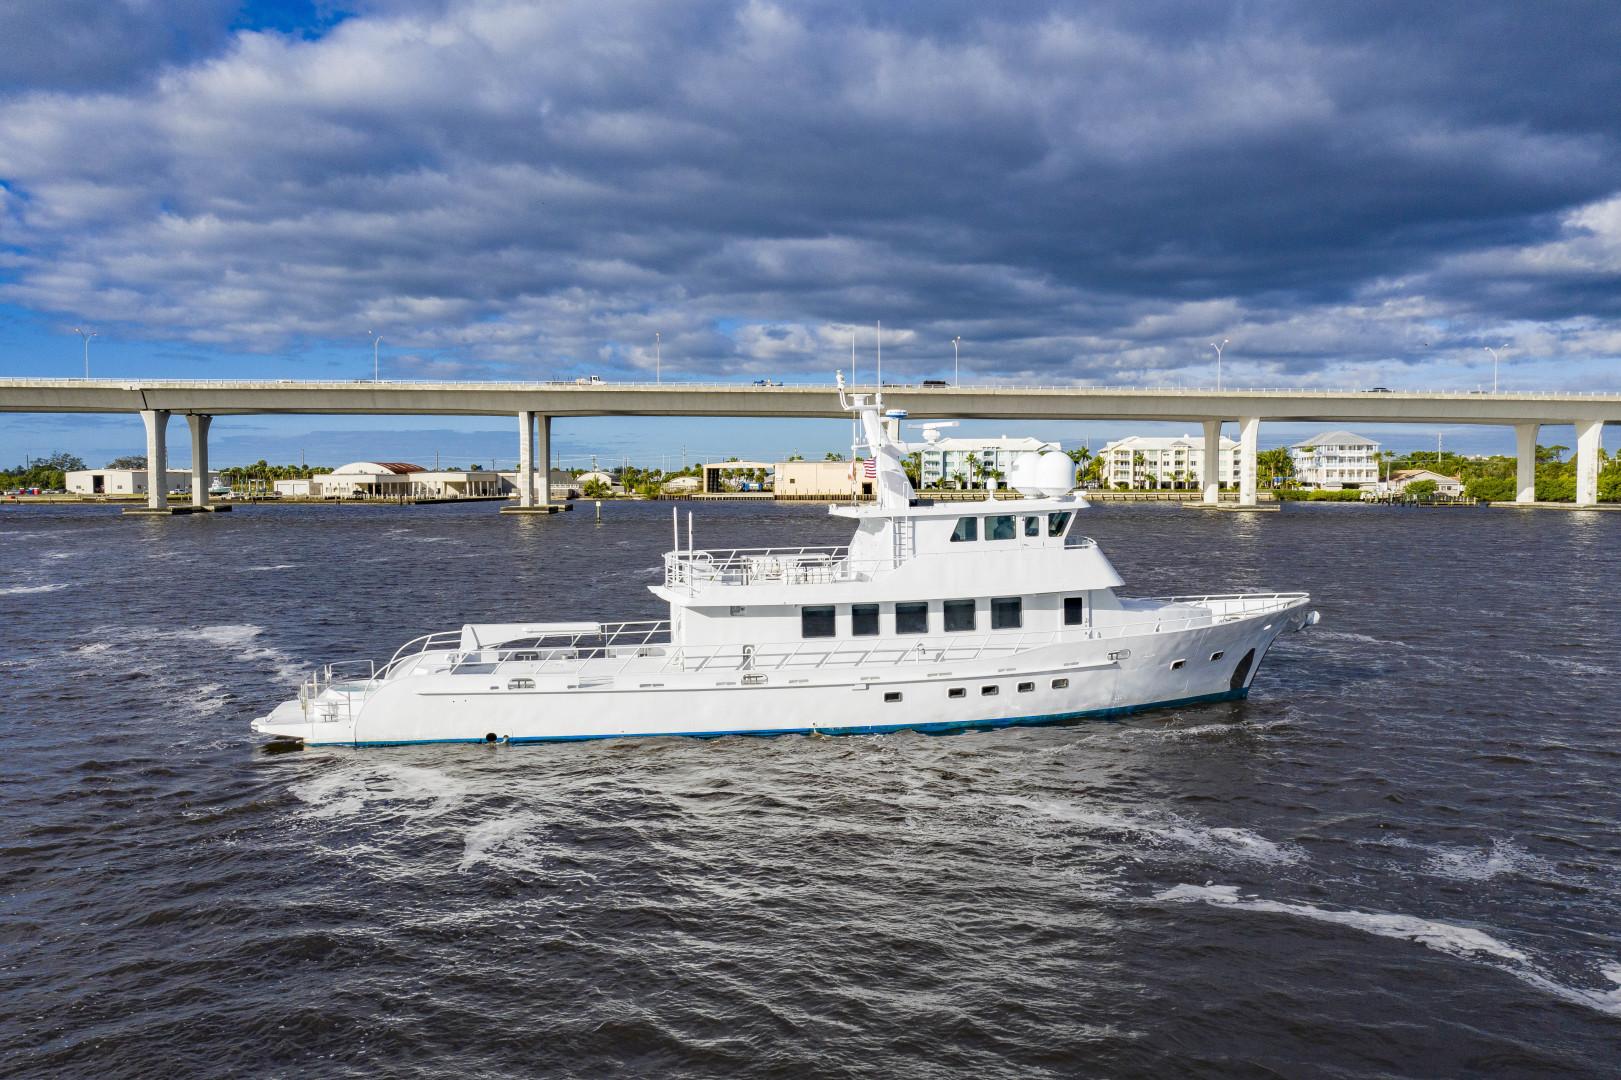 GlassTech-Expedition Yacht 2018-Reset Stuart-Florida-United States-Profile-1568542 | Thumbnail